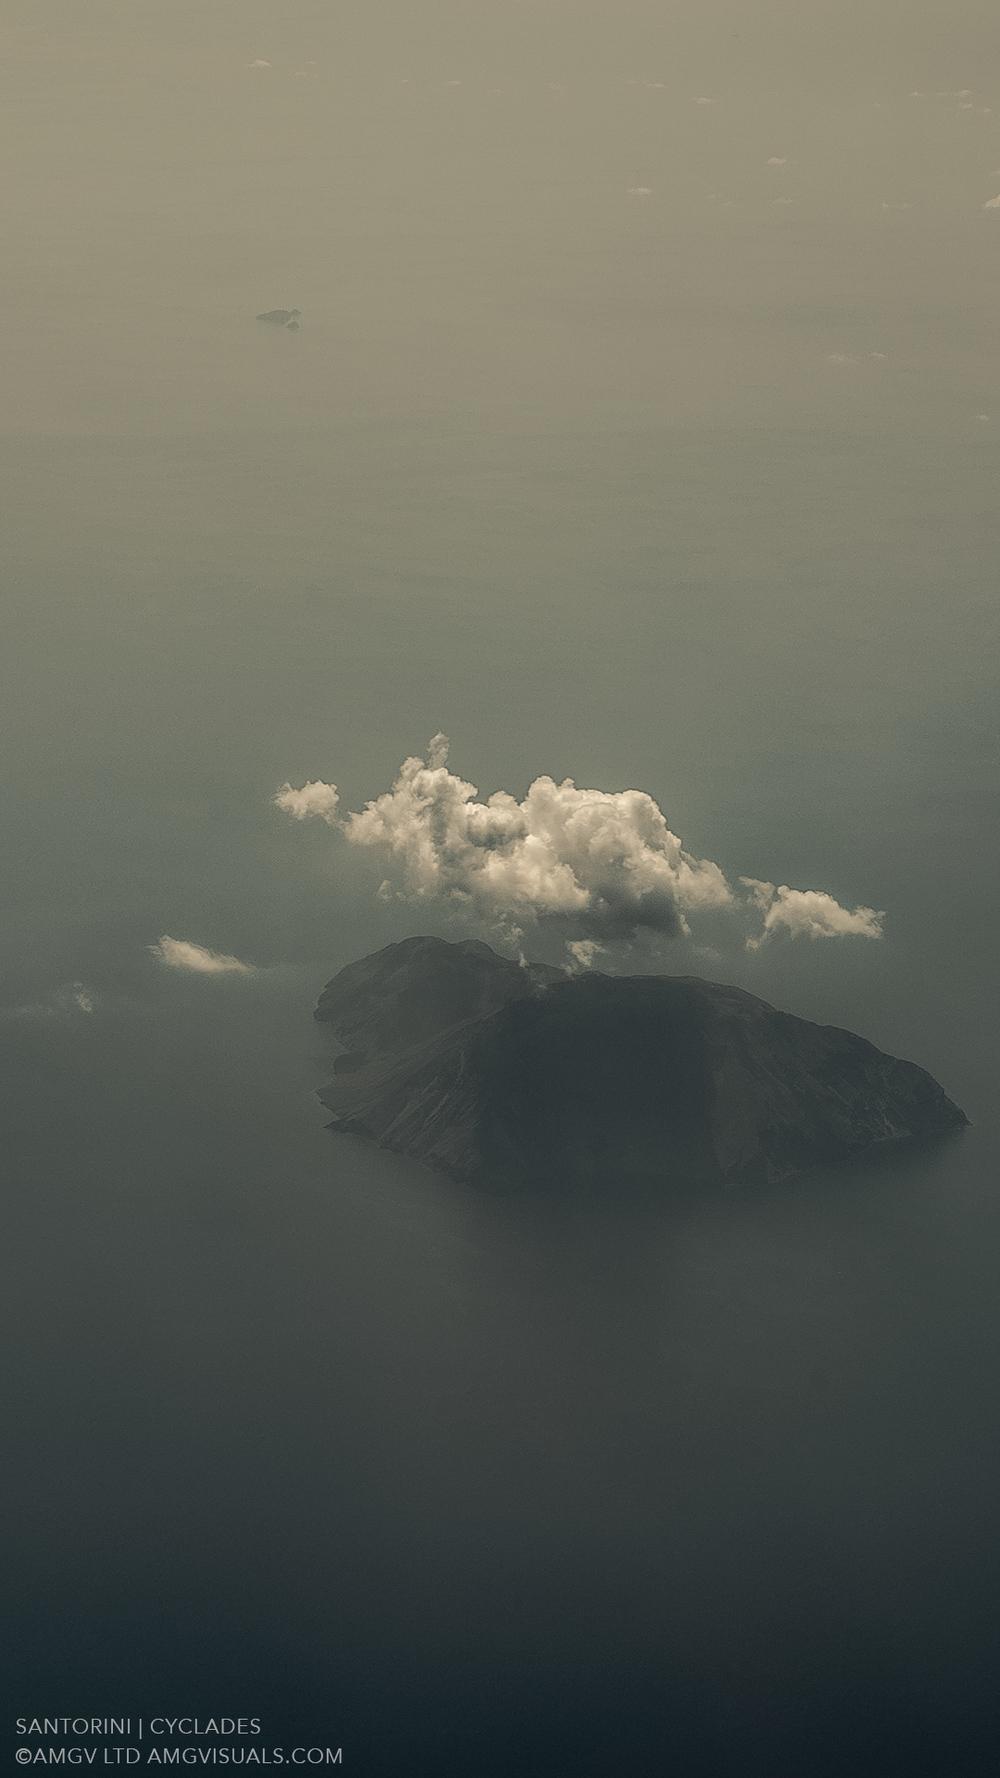 ©AMGV-LTD-Santorini+Cyclades-5.jpg